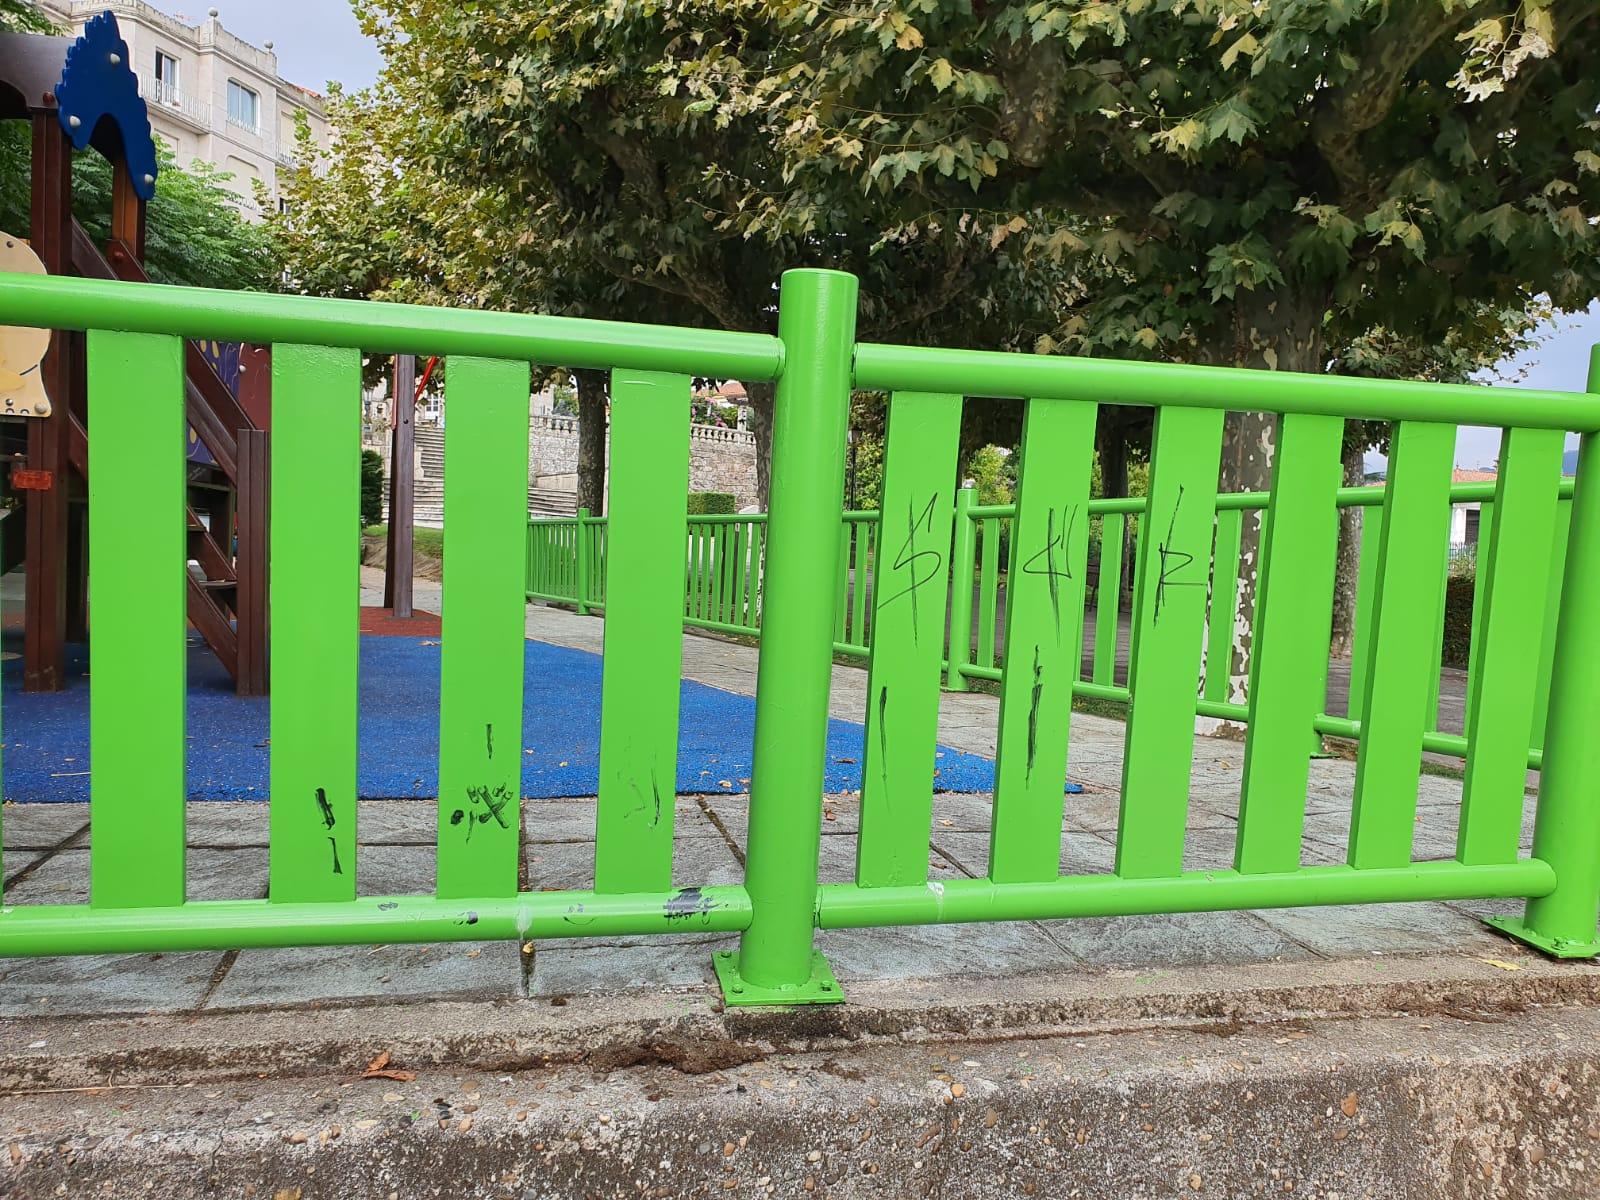 16092020 Parques Infantís - Actos vandálicos 3